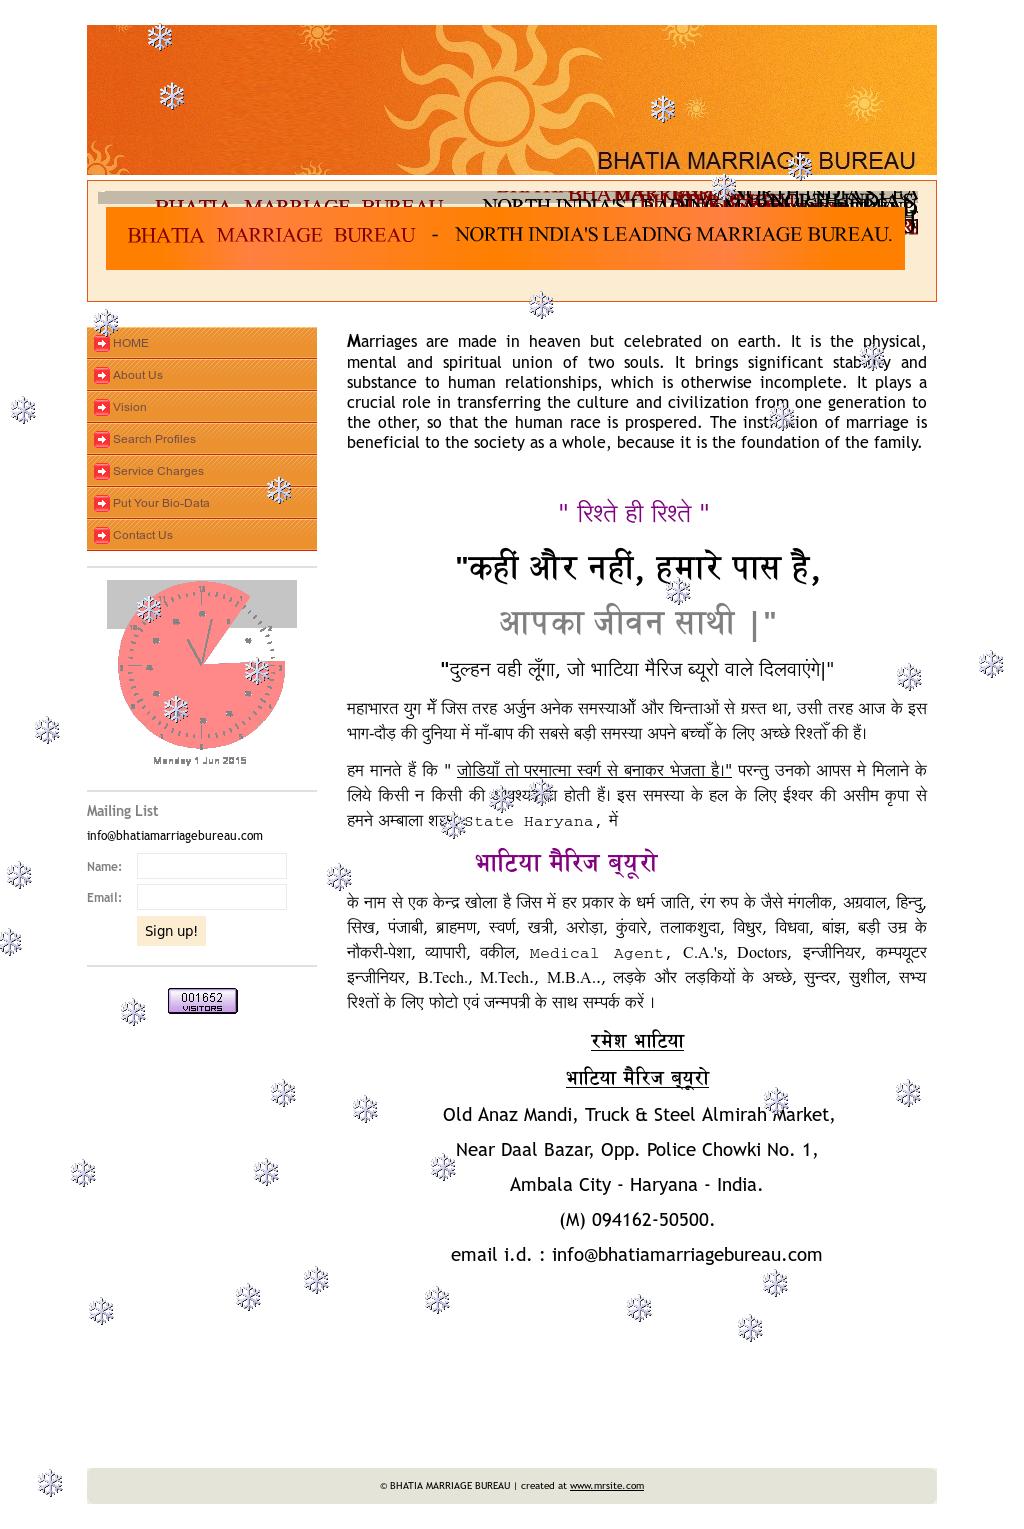 Bhatia Marriage Bureau Competitors, Revenue and Employees - Owler